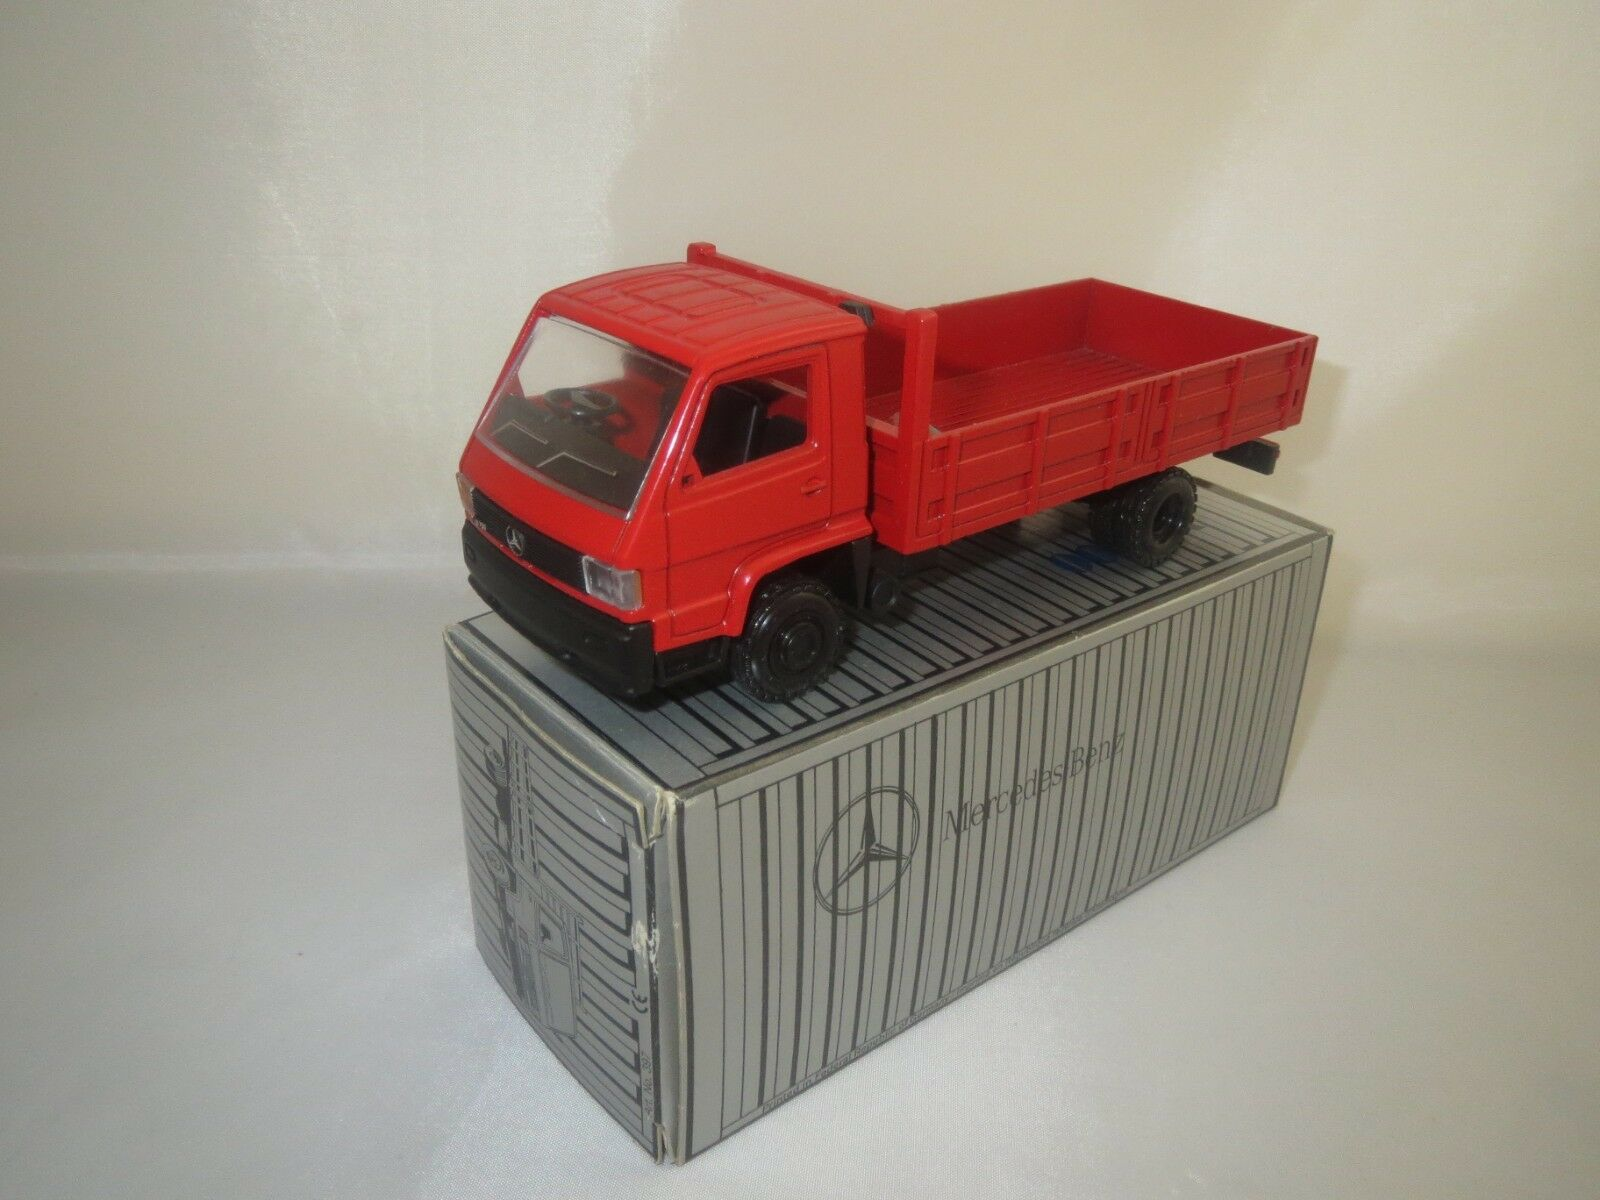 NZG Mercedes-Benz 700 (Rouge) 1 43 DANS neuf dans sa boîte